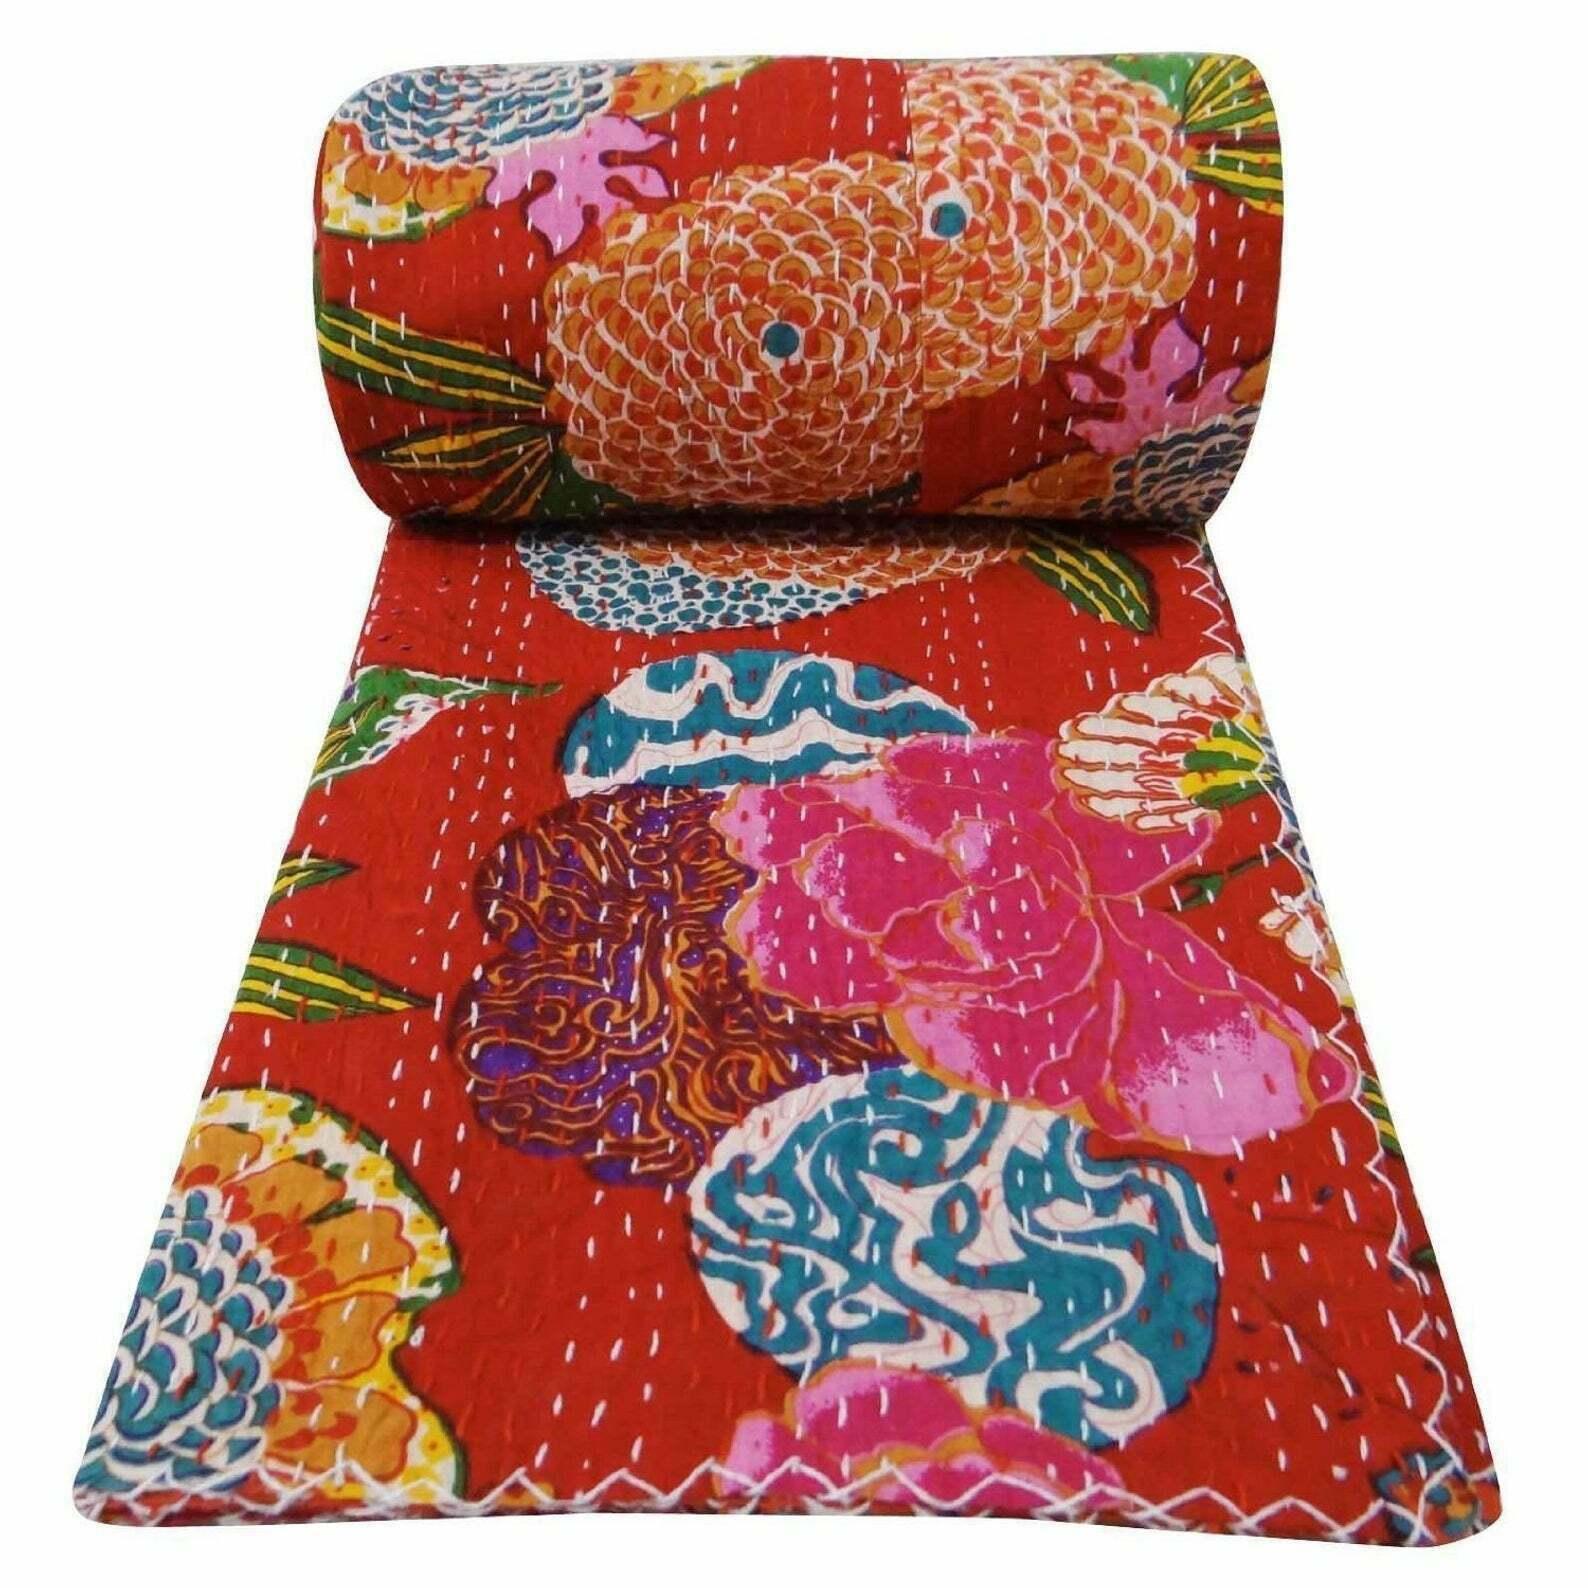 Handmade Vintage Kantha Quilt Blanket Twin Size 100% Cotton